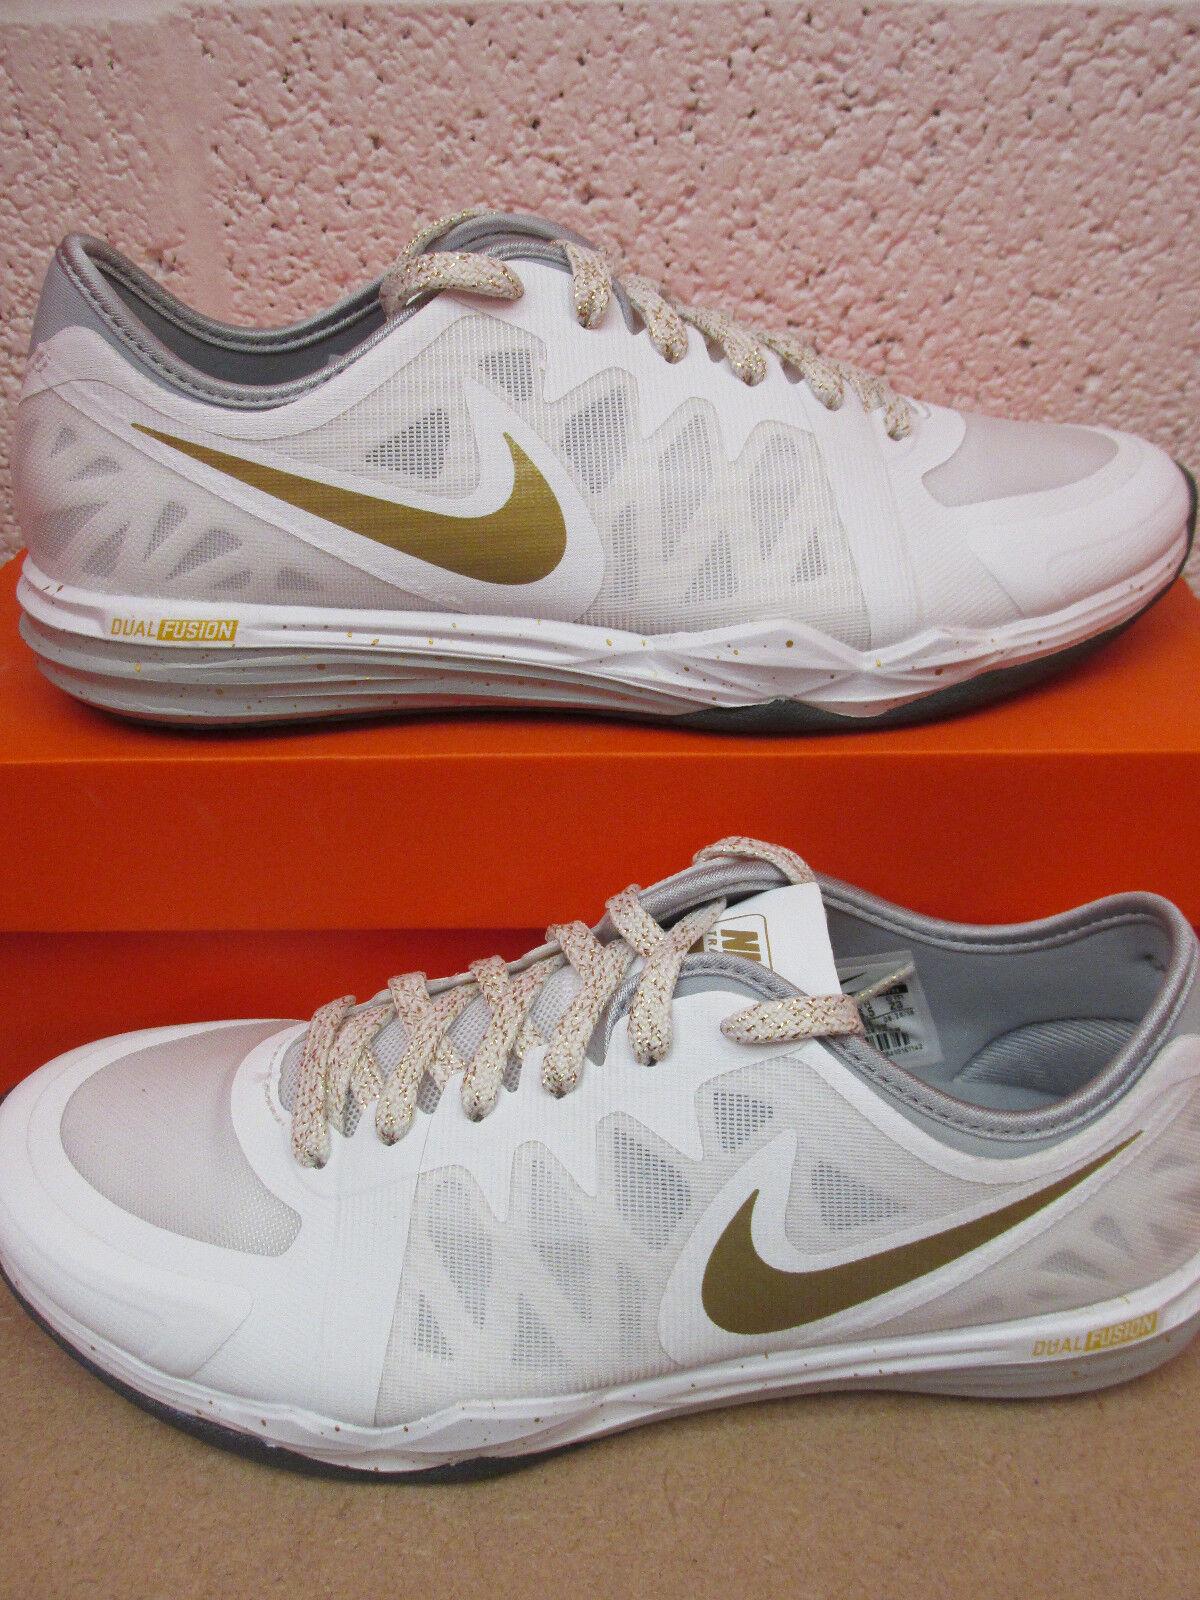 Nike Nike Nike Damenschuhe Dual Fusion TR 3 Print Running Trainers 704941 103 Sneakers Schuhes 33e9a0